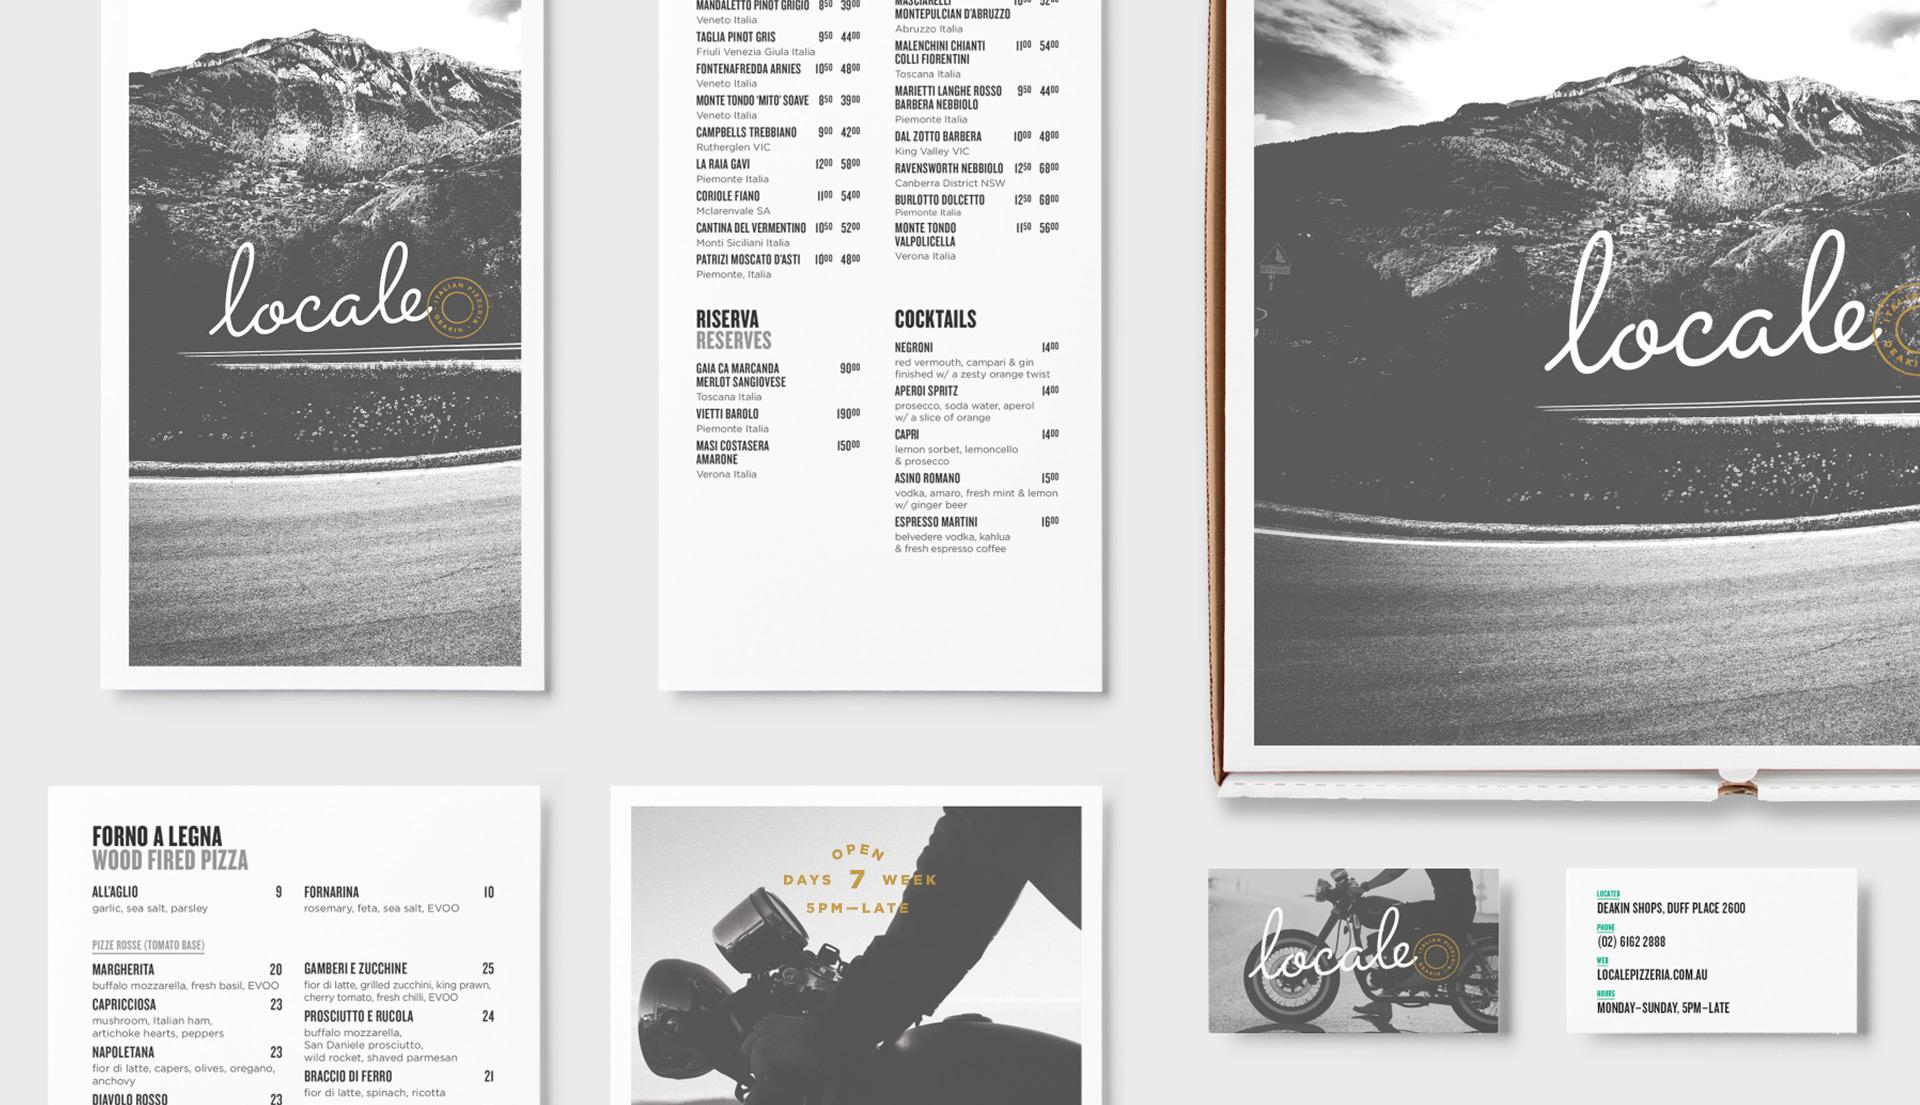 IKL-WEB_2014_1920-Content-Locale_06